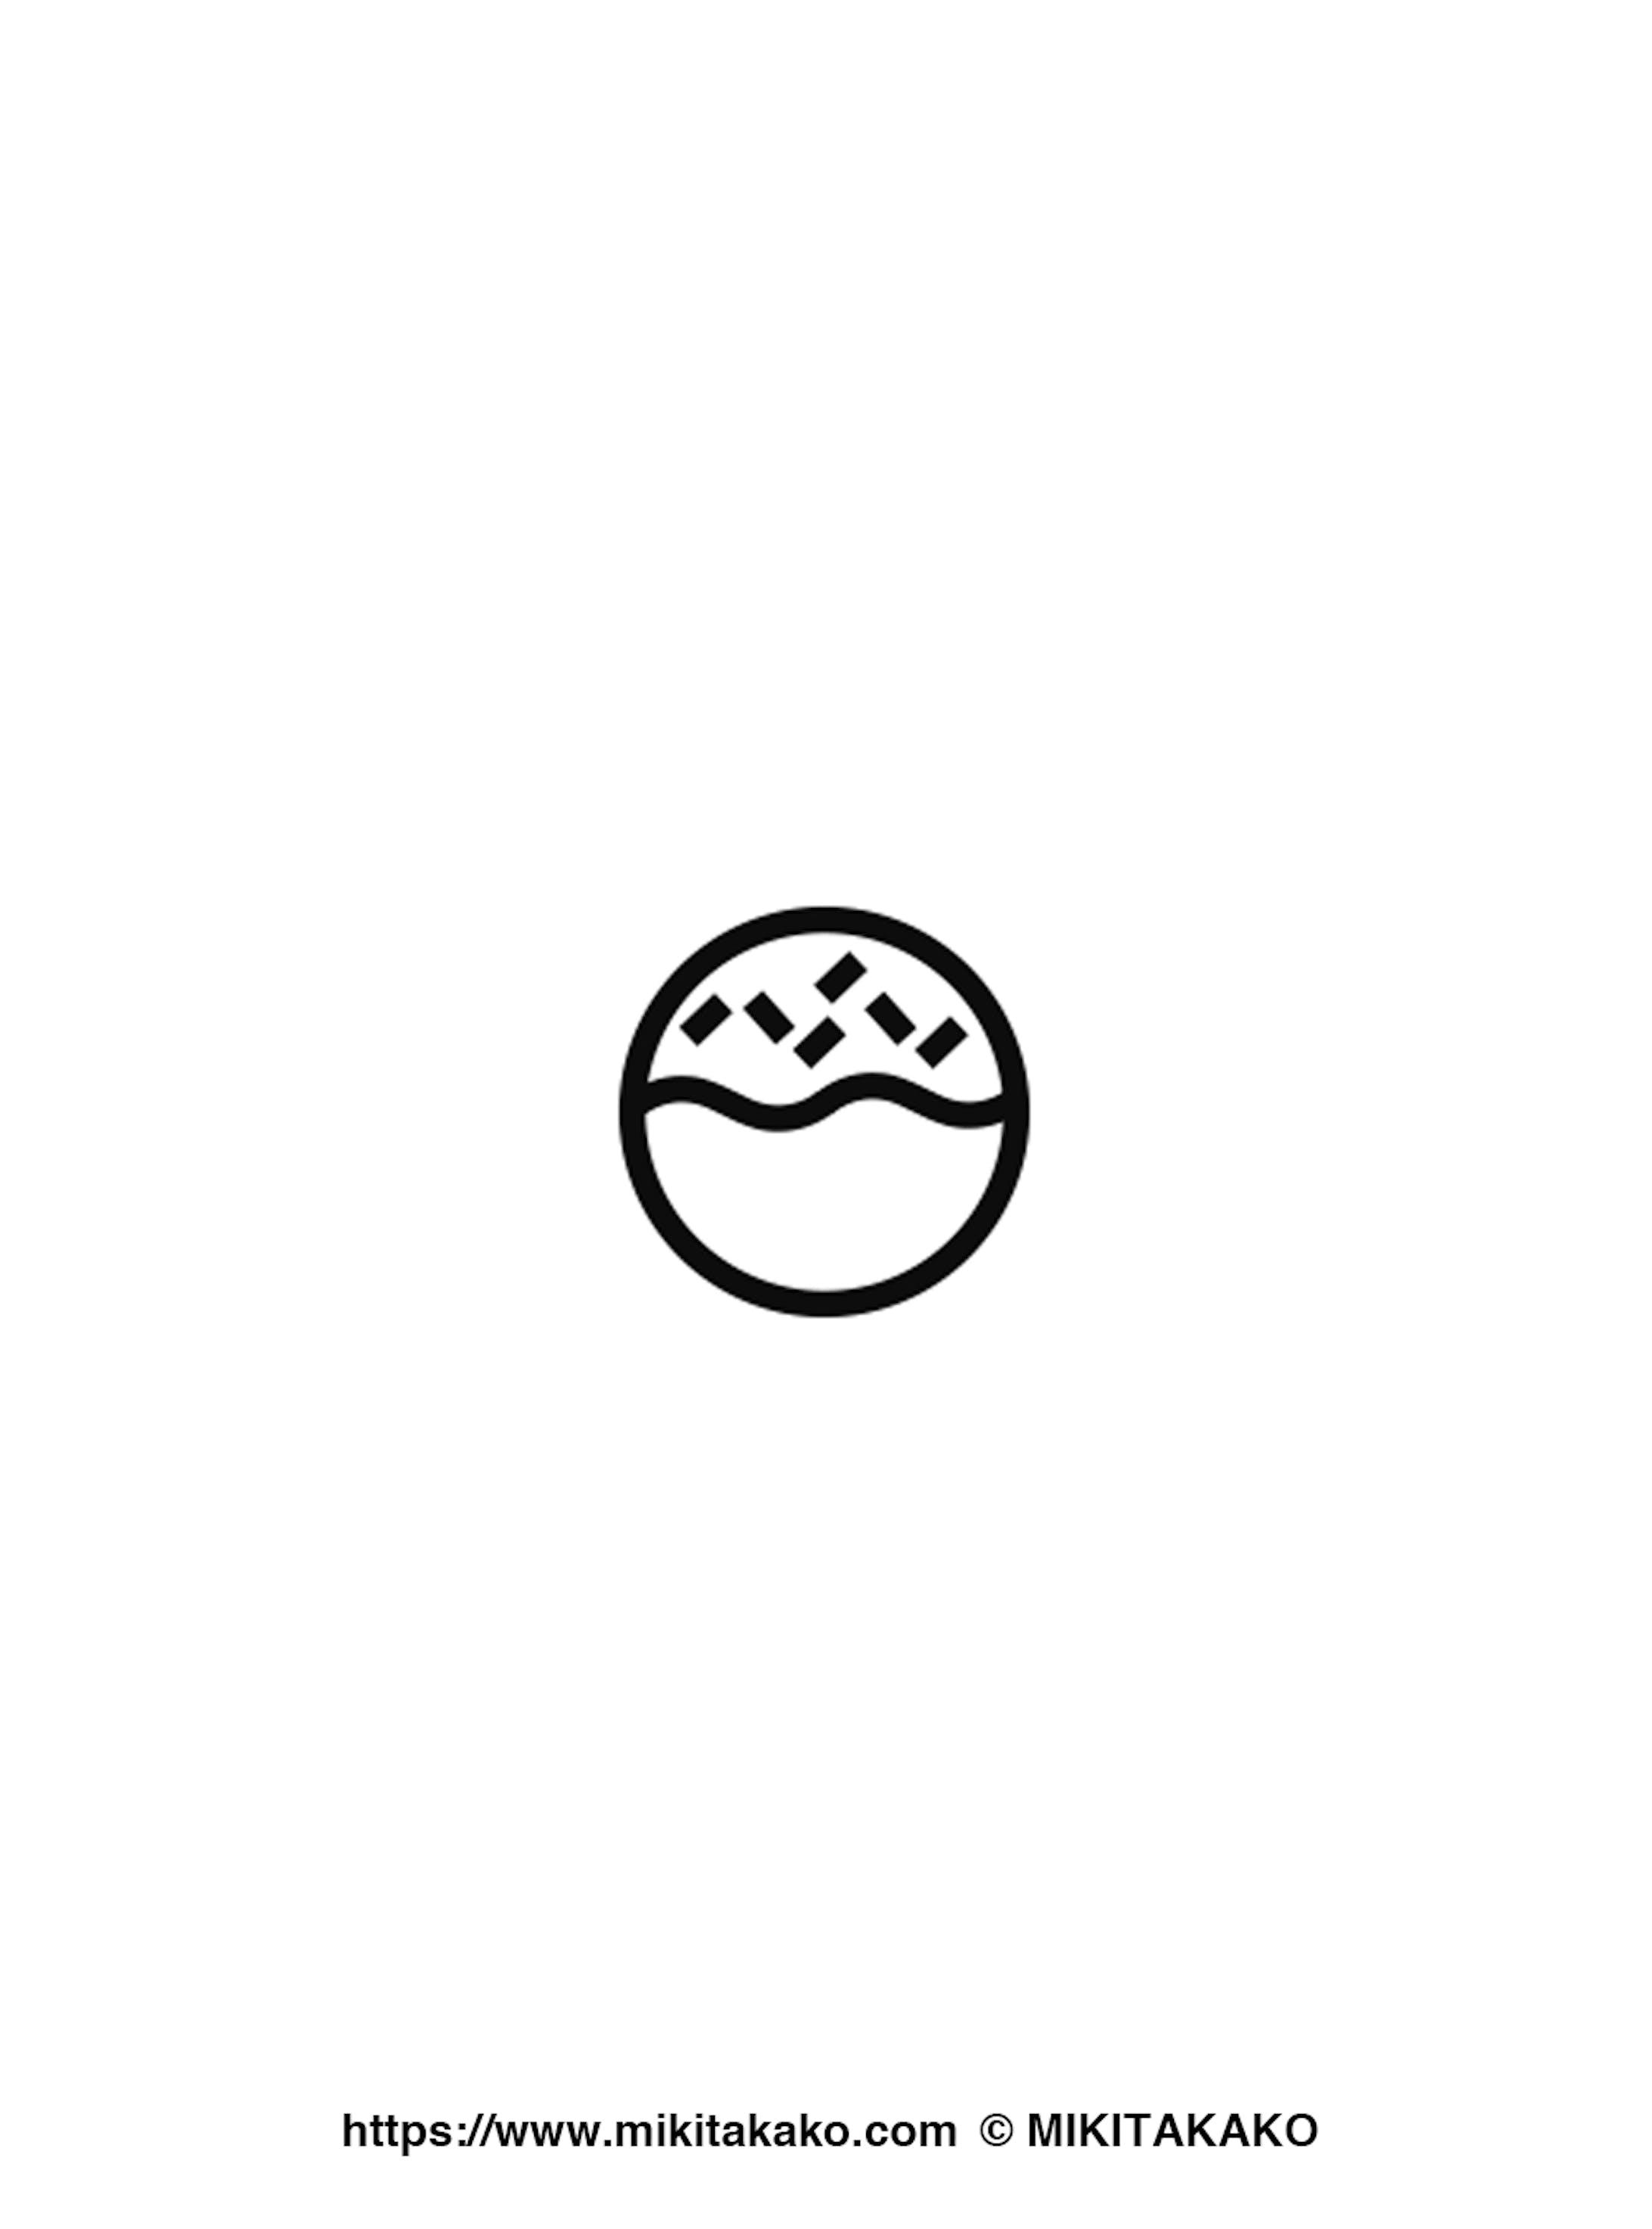 My logo design-1